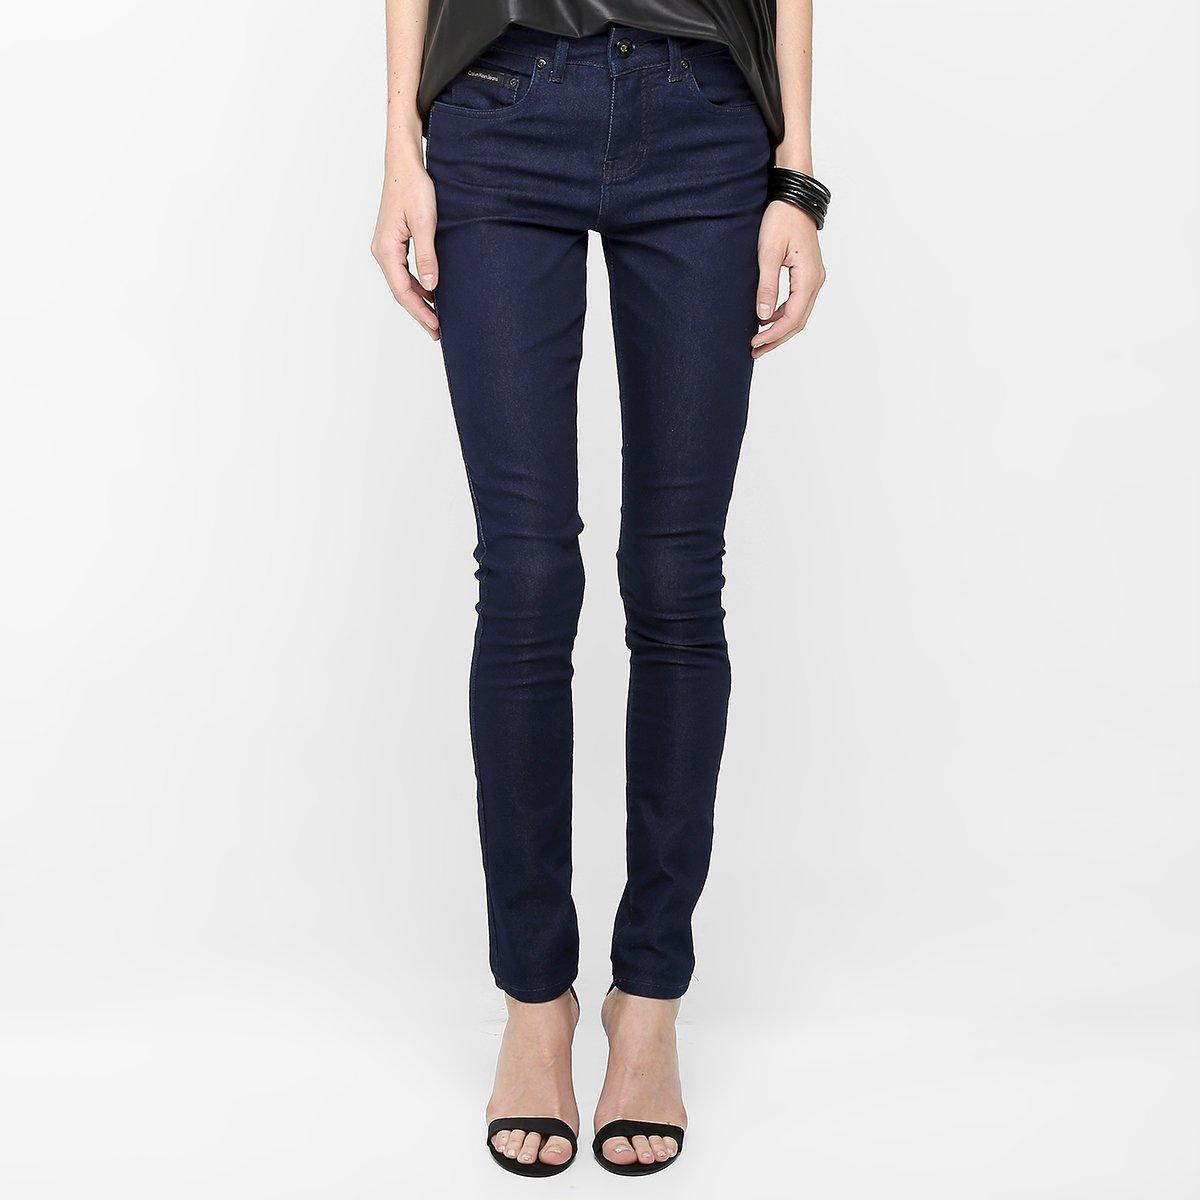 Calça Jeans Calvin Klein Jegging High - Compre Agora   Netshoes 8a60daf949